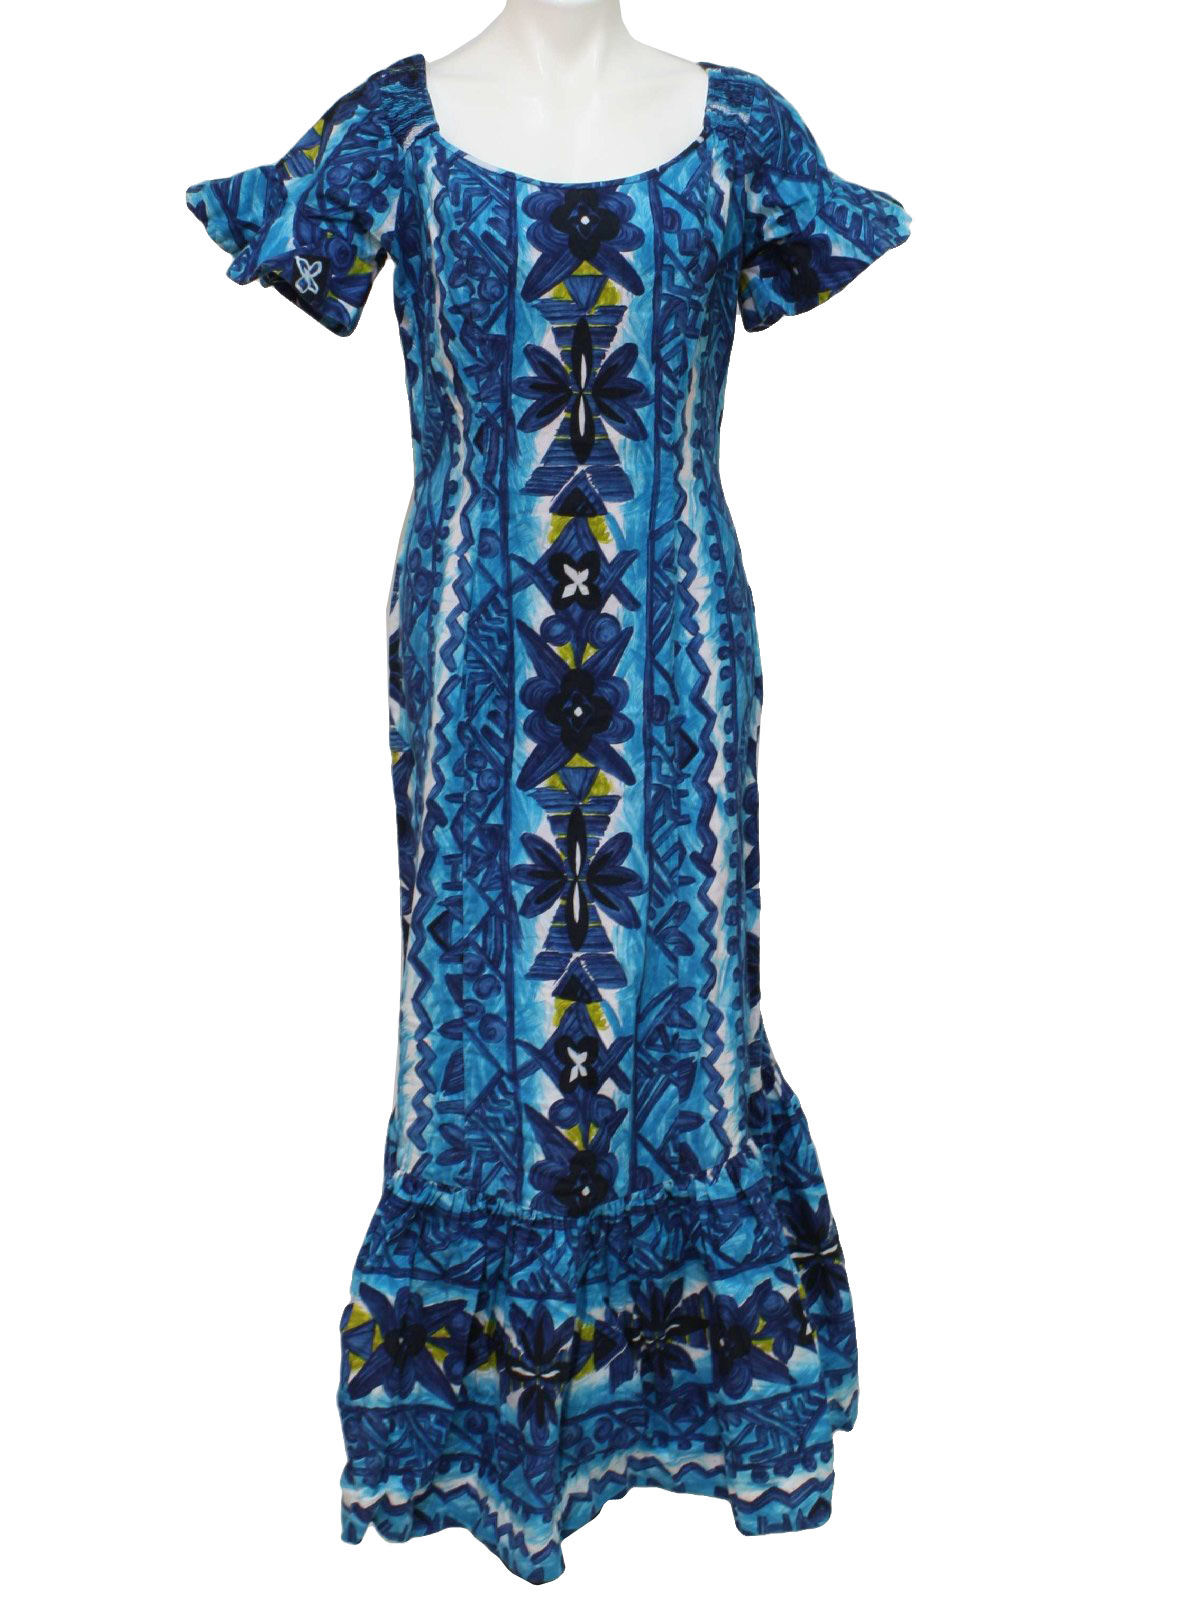 e1d597d54b16 Vintage 70s Hawaiian Dress: 70s -Reef- Womens navy blue, white ...